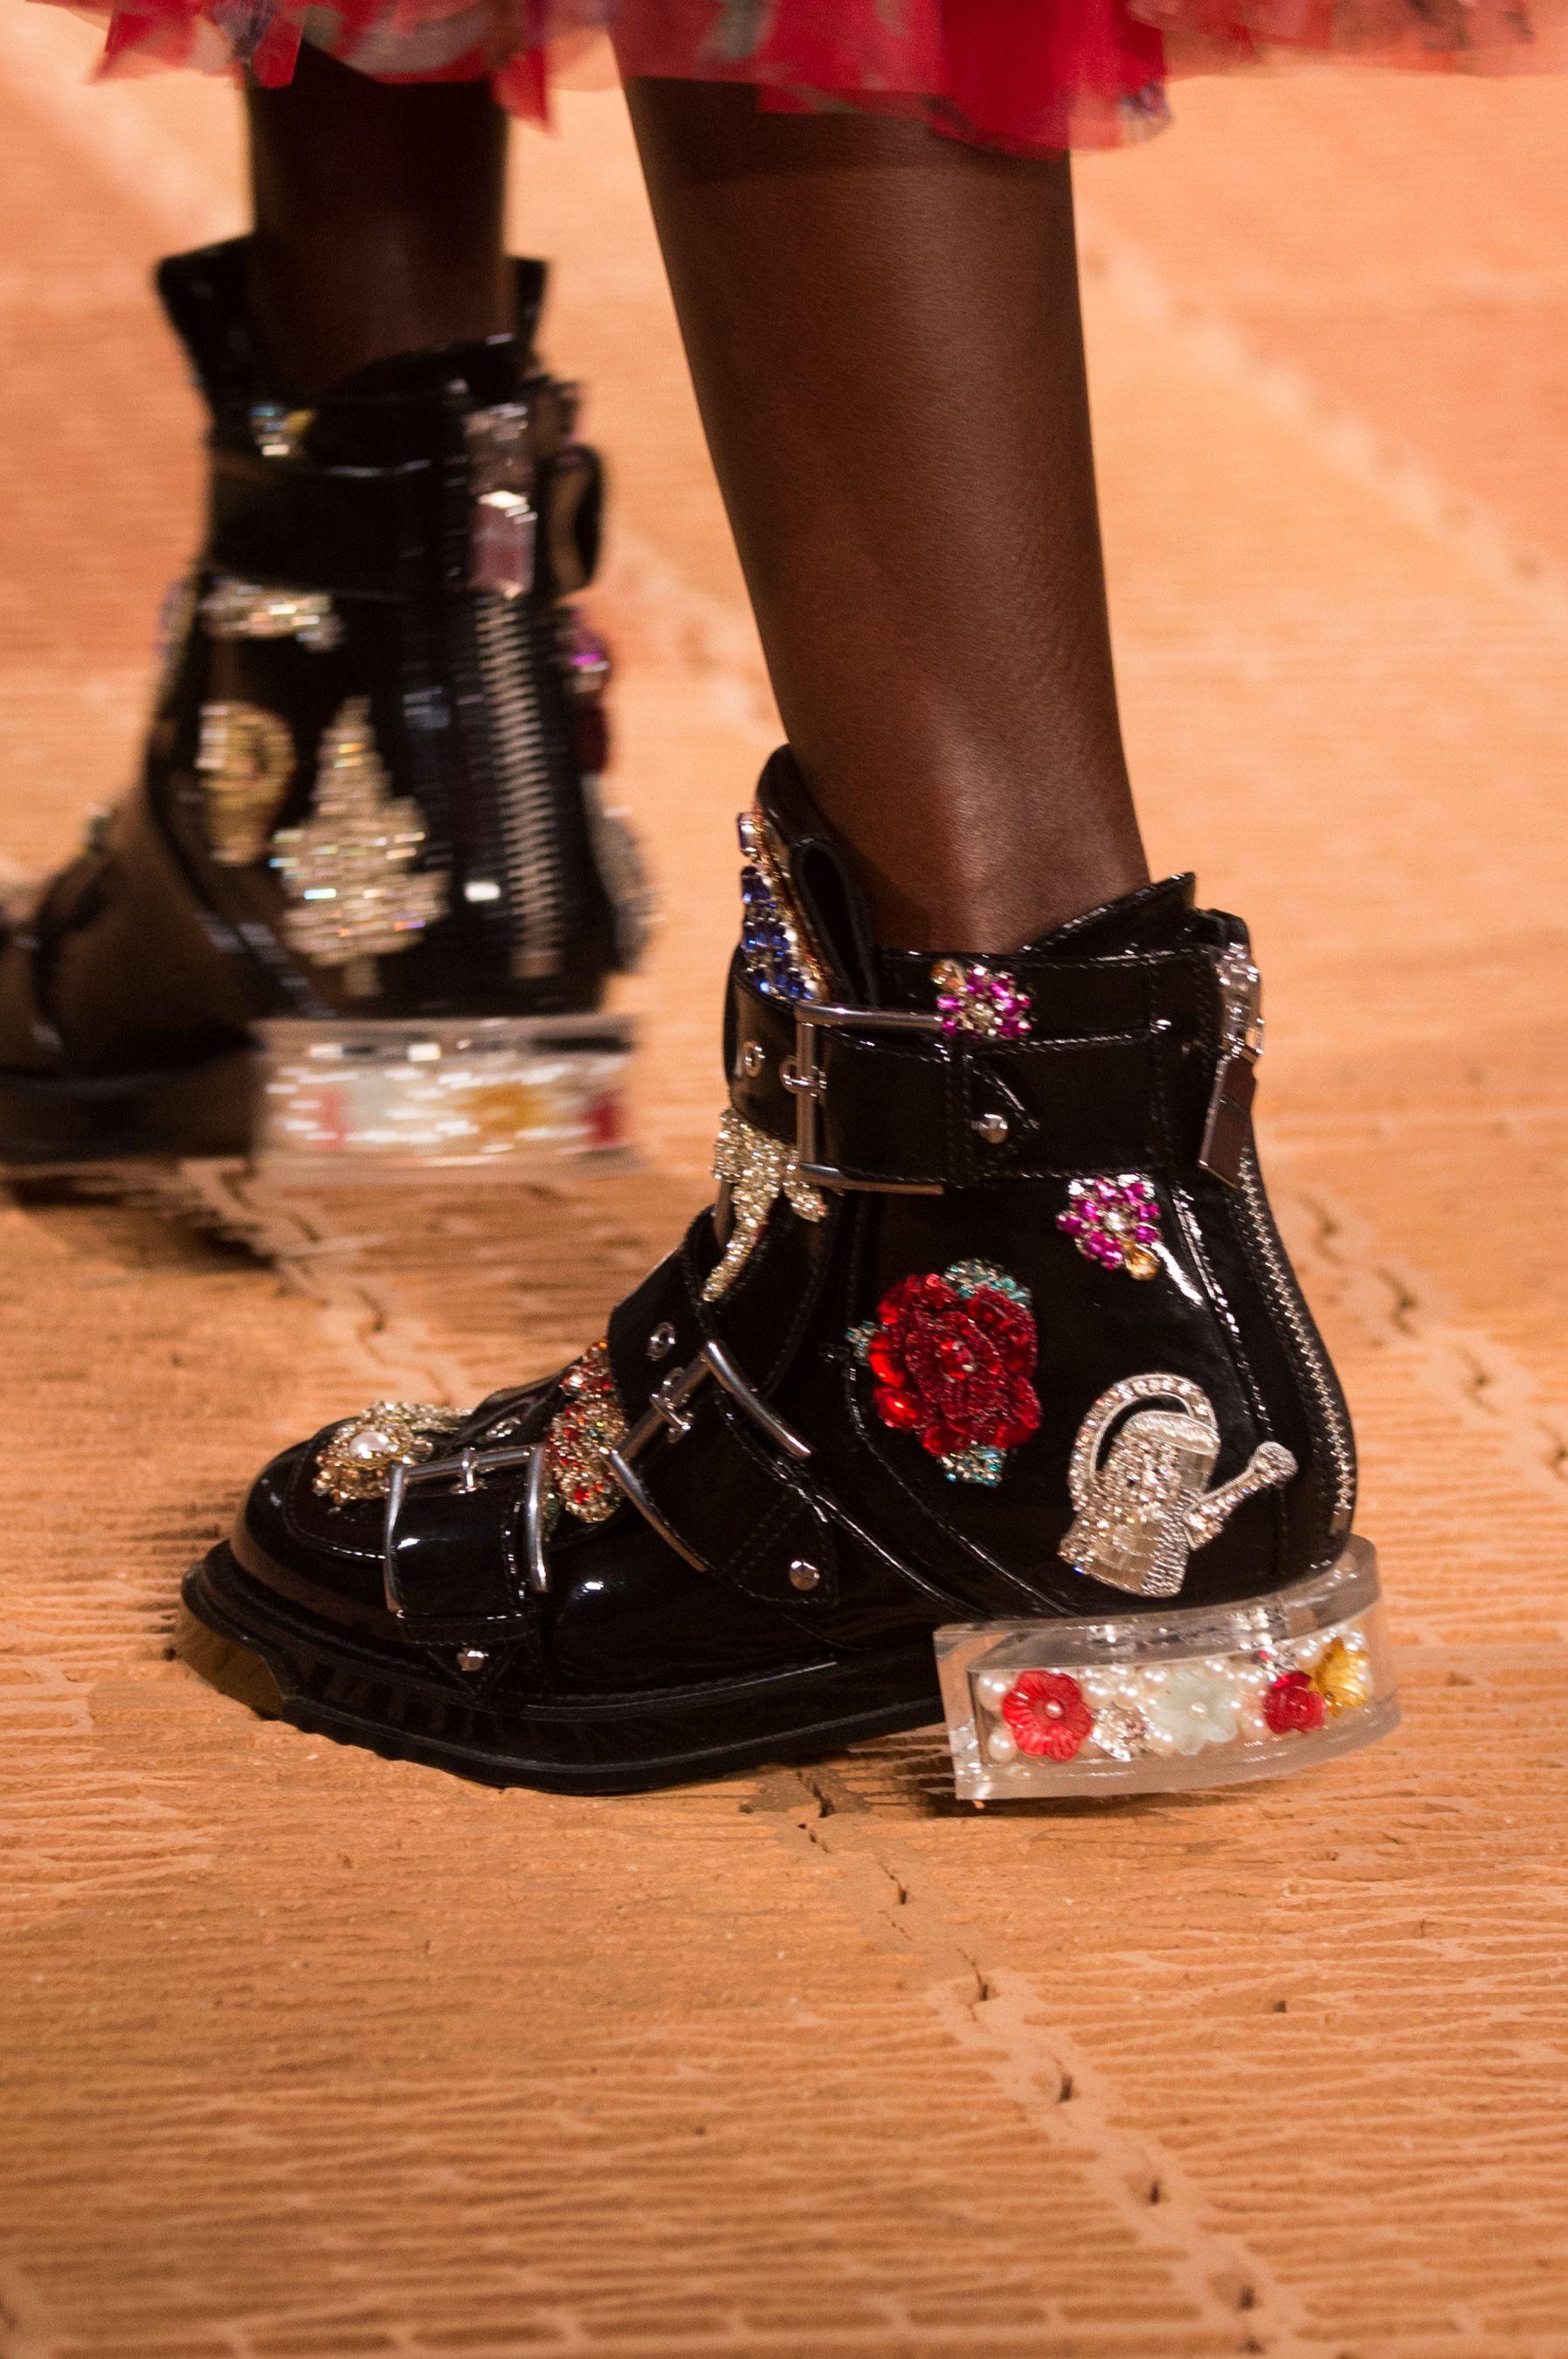 Alexander Mcqueen Spring 2018 Fashion Show Details Fashion Shoes